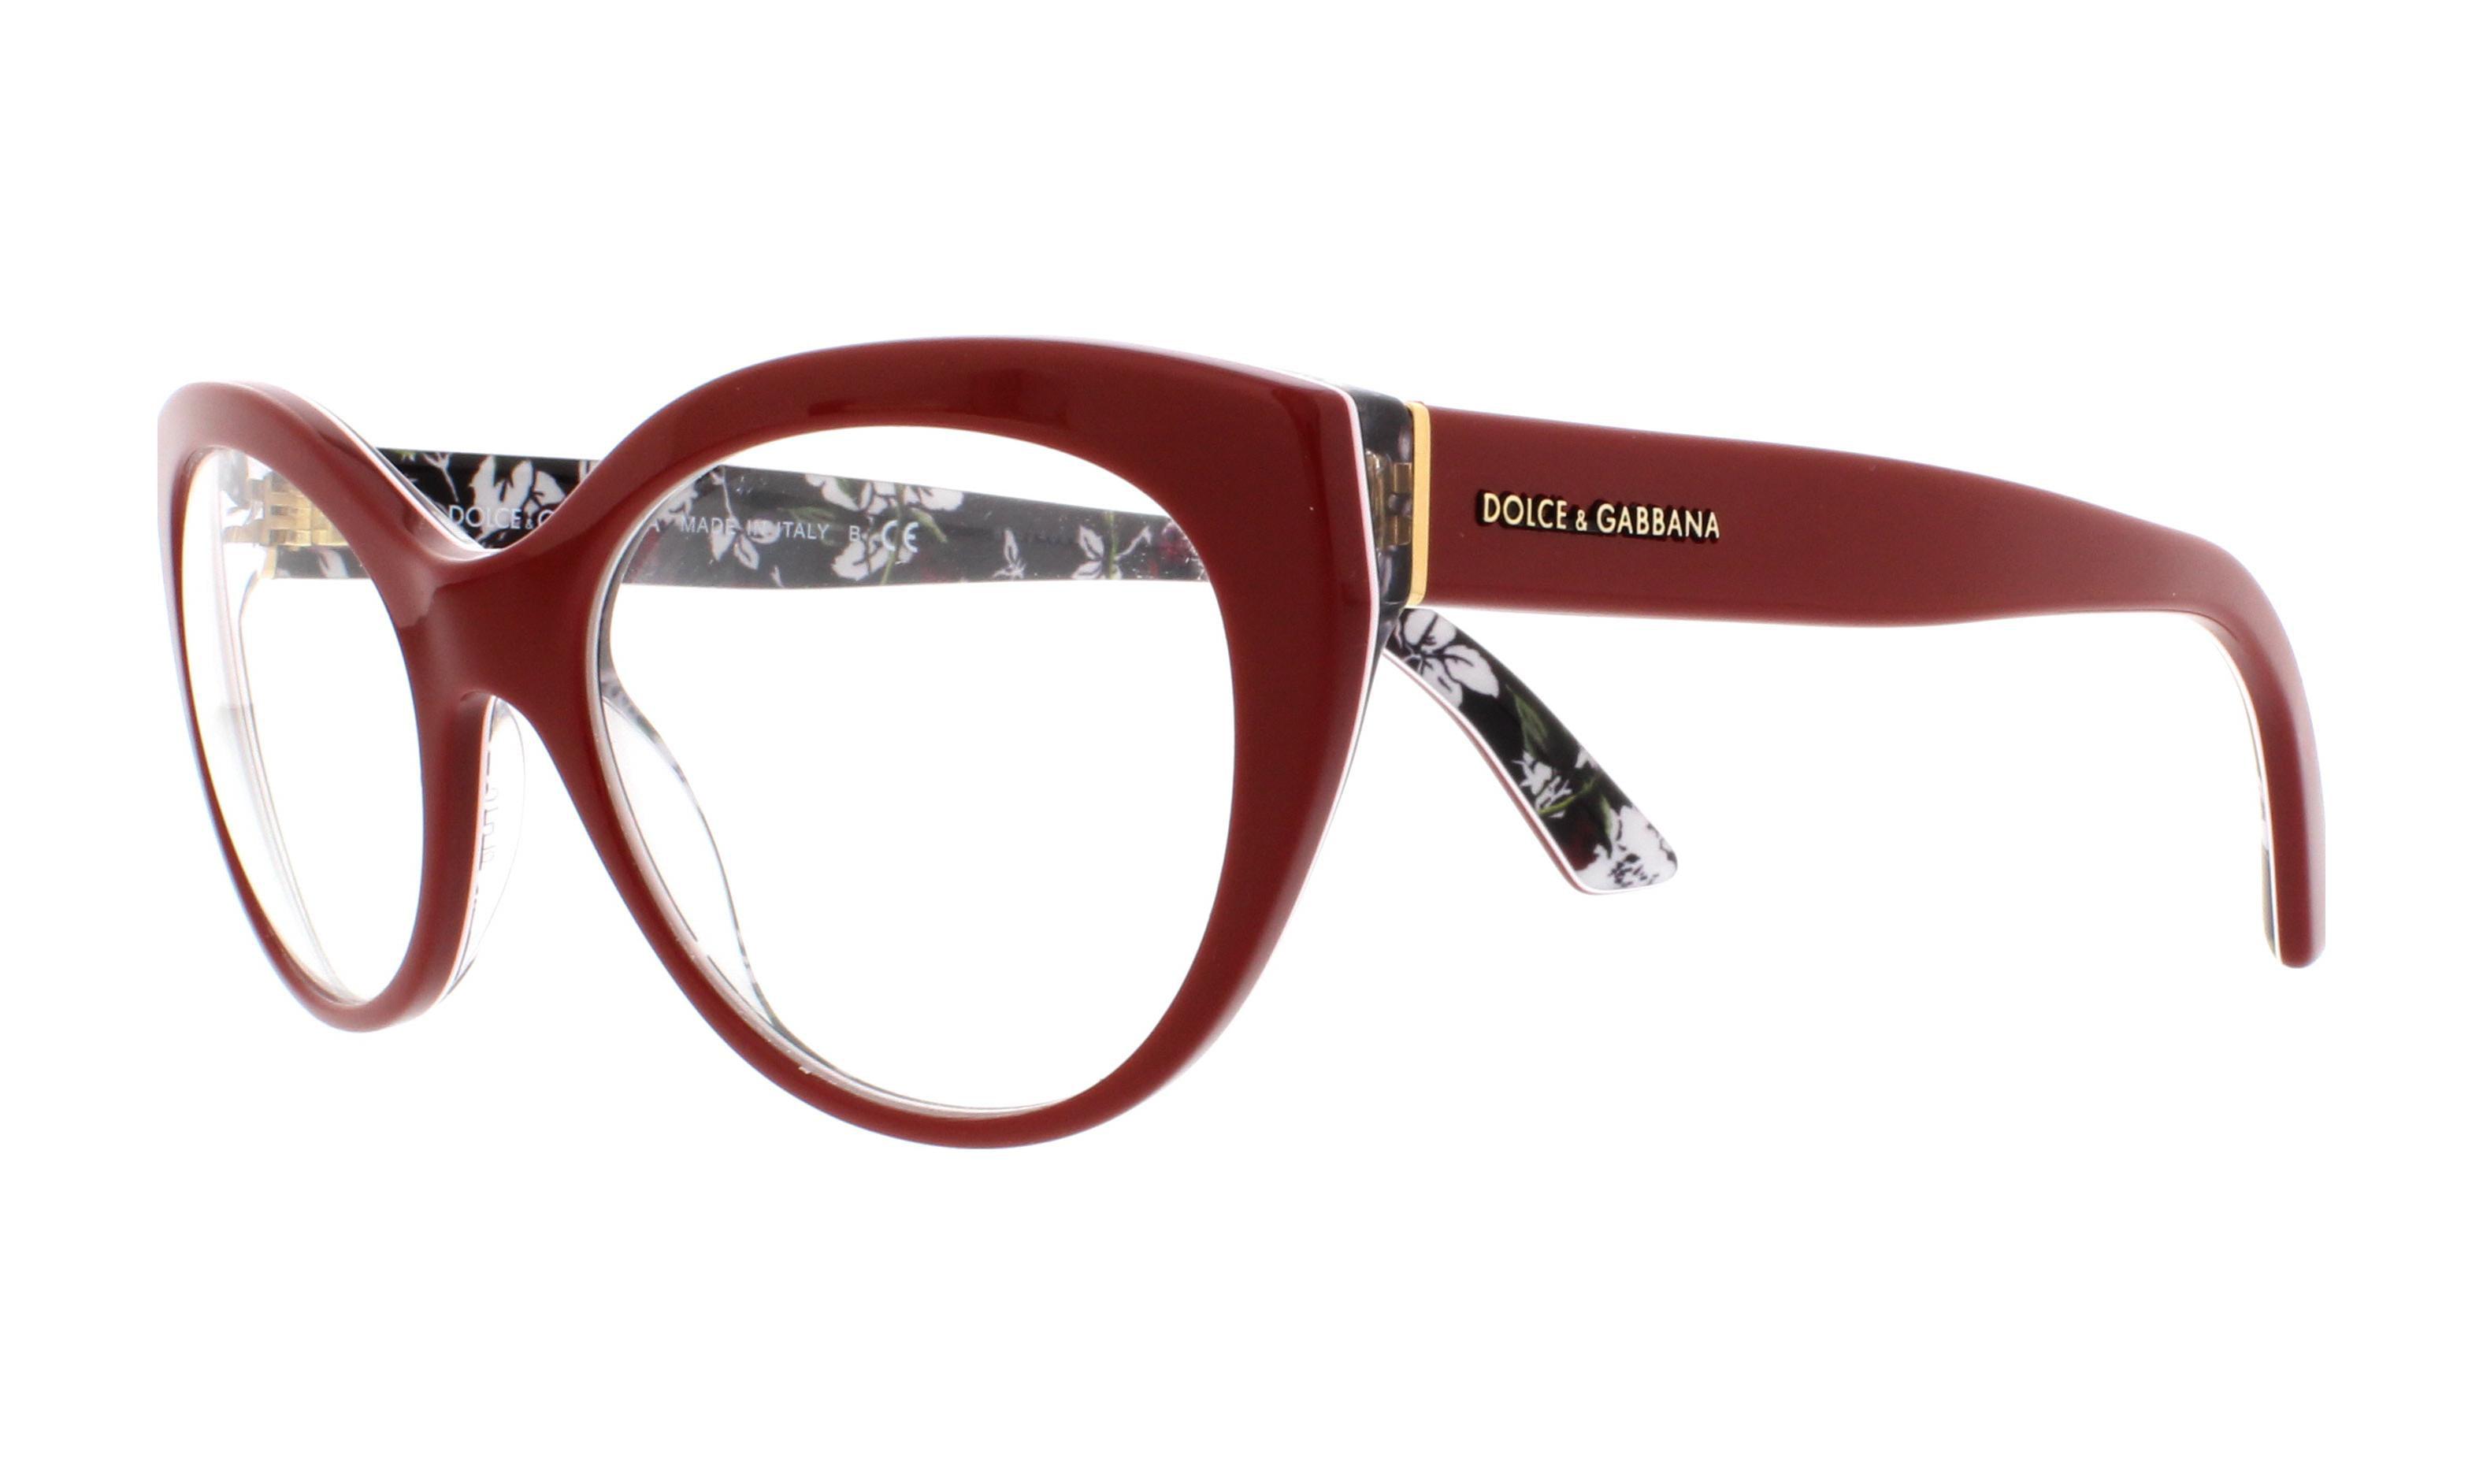 DOLCE & GABBANA Eyeglasses DG 3246 3020 Top Red/Rose Print 51MM ...